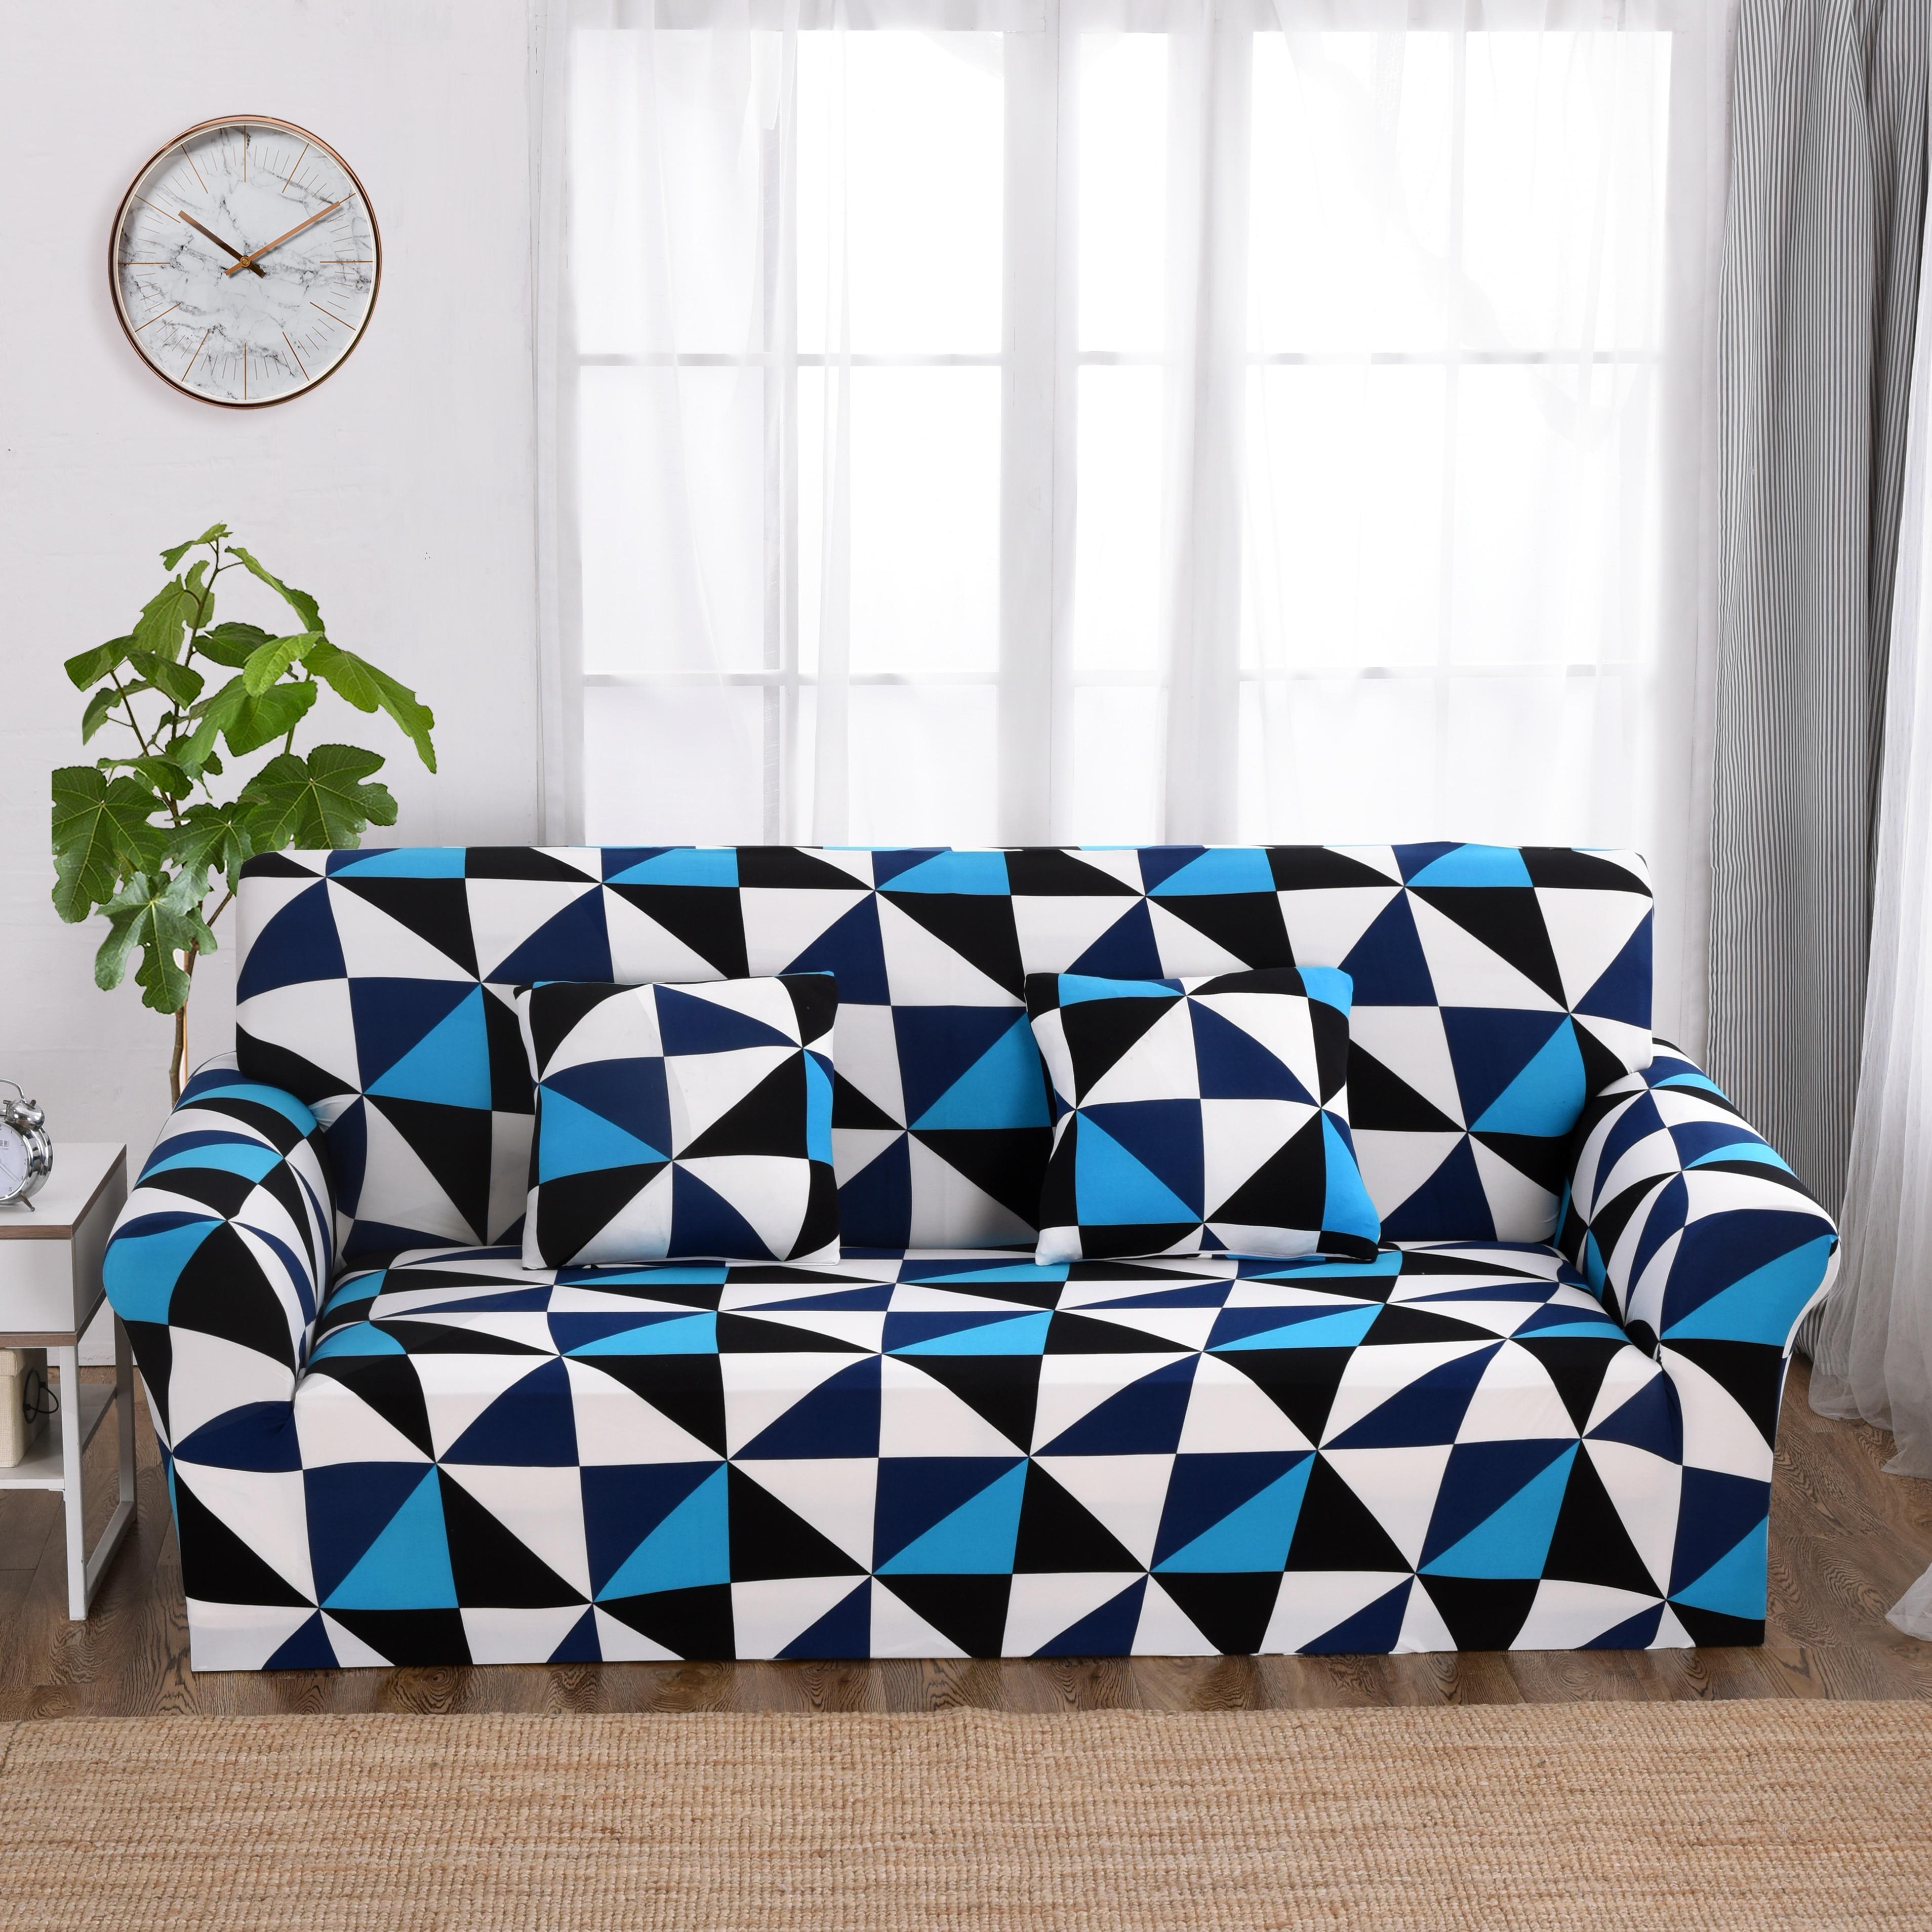 pare Prices on Sofas Free line Shopping Buy Low Price Sofas